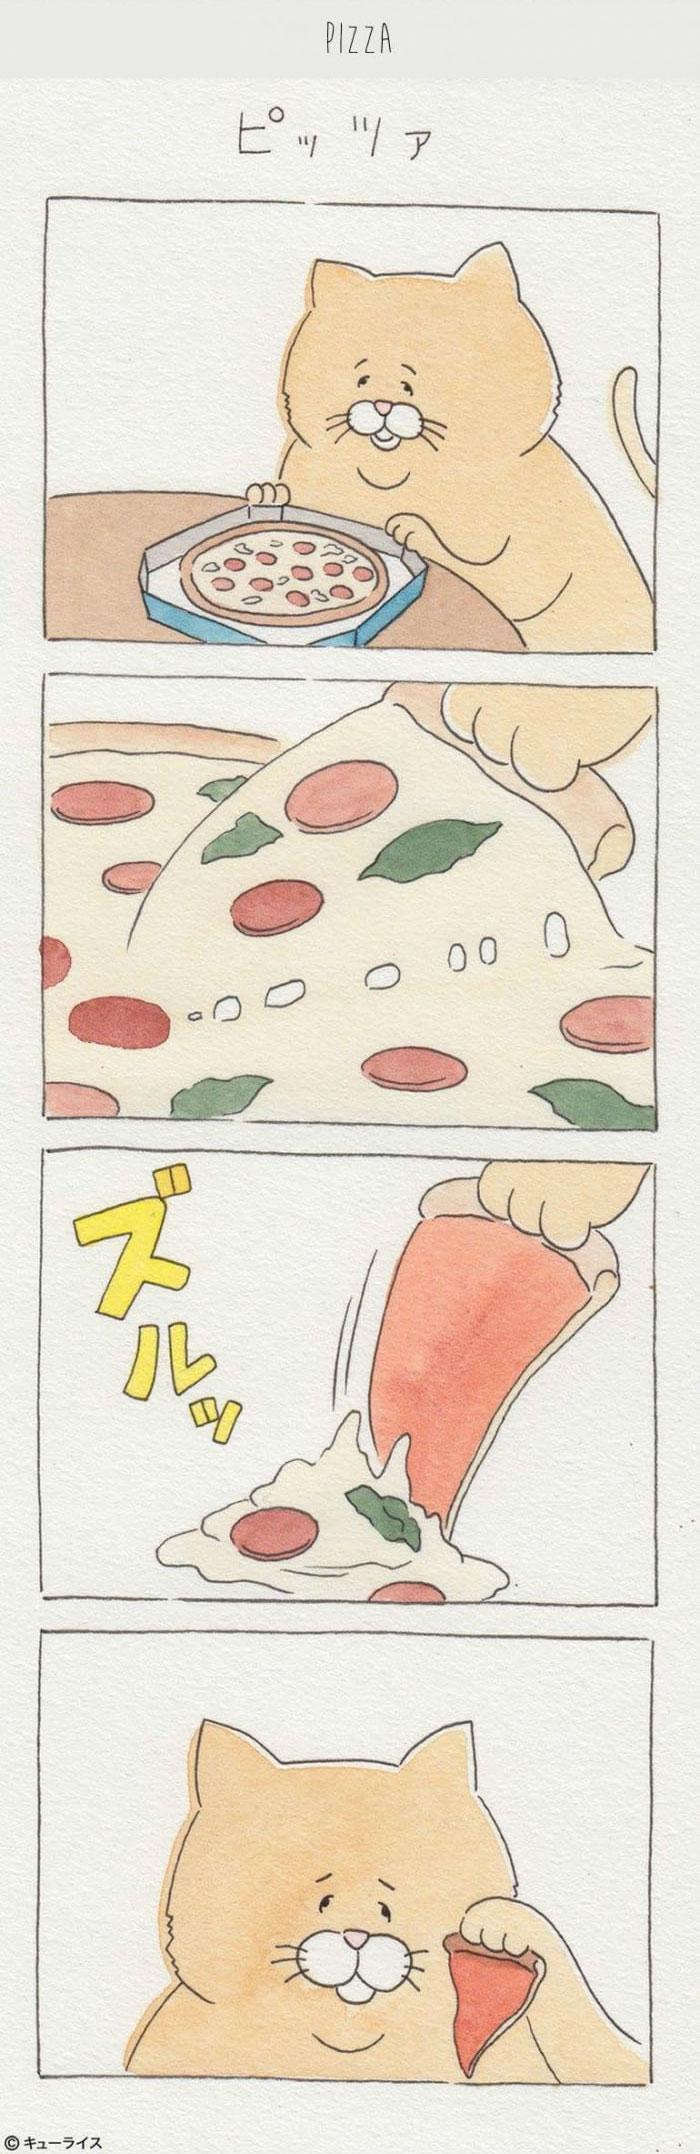 Funny Comics By Q-rais